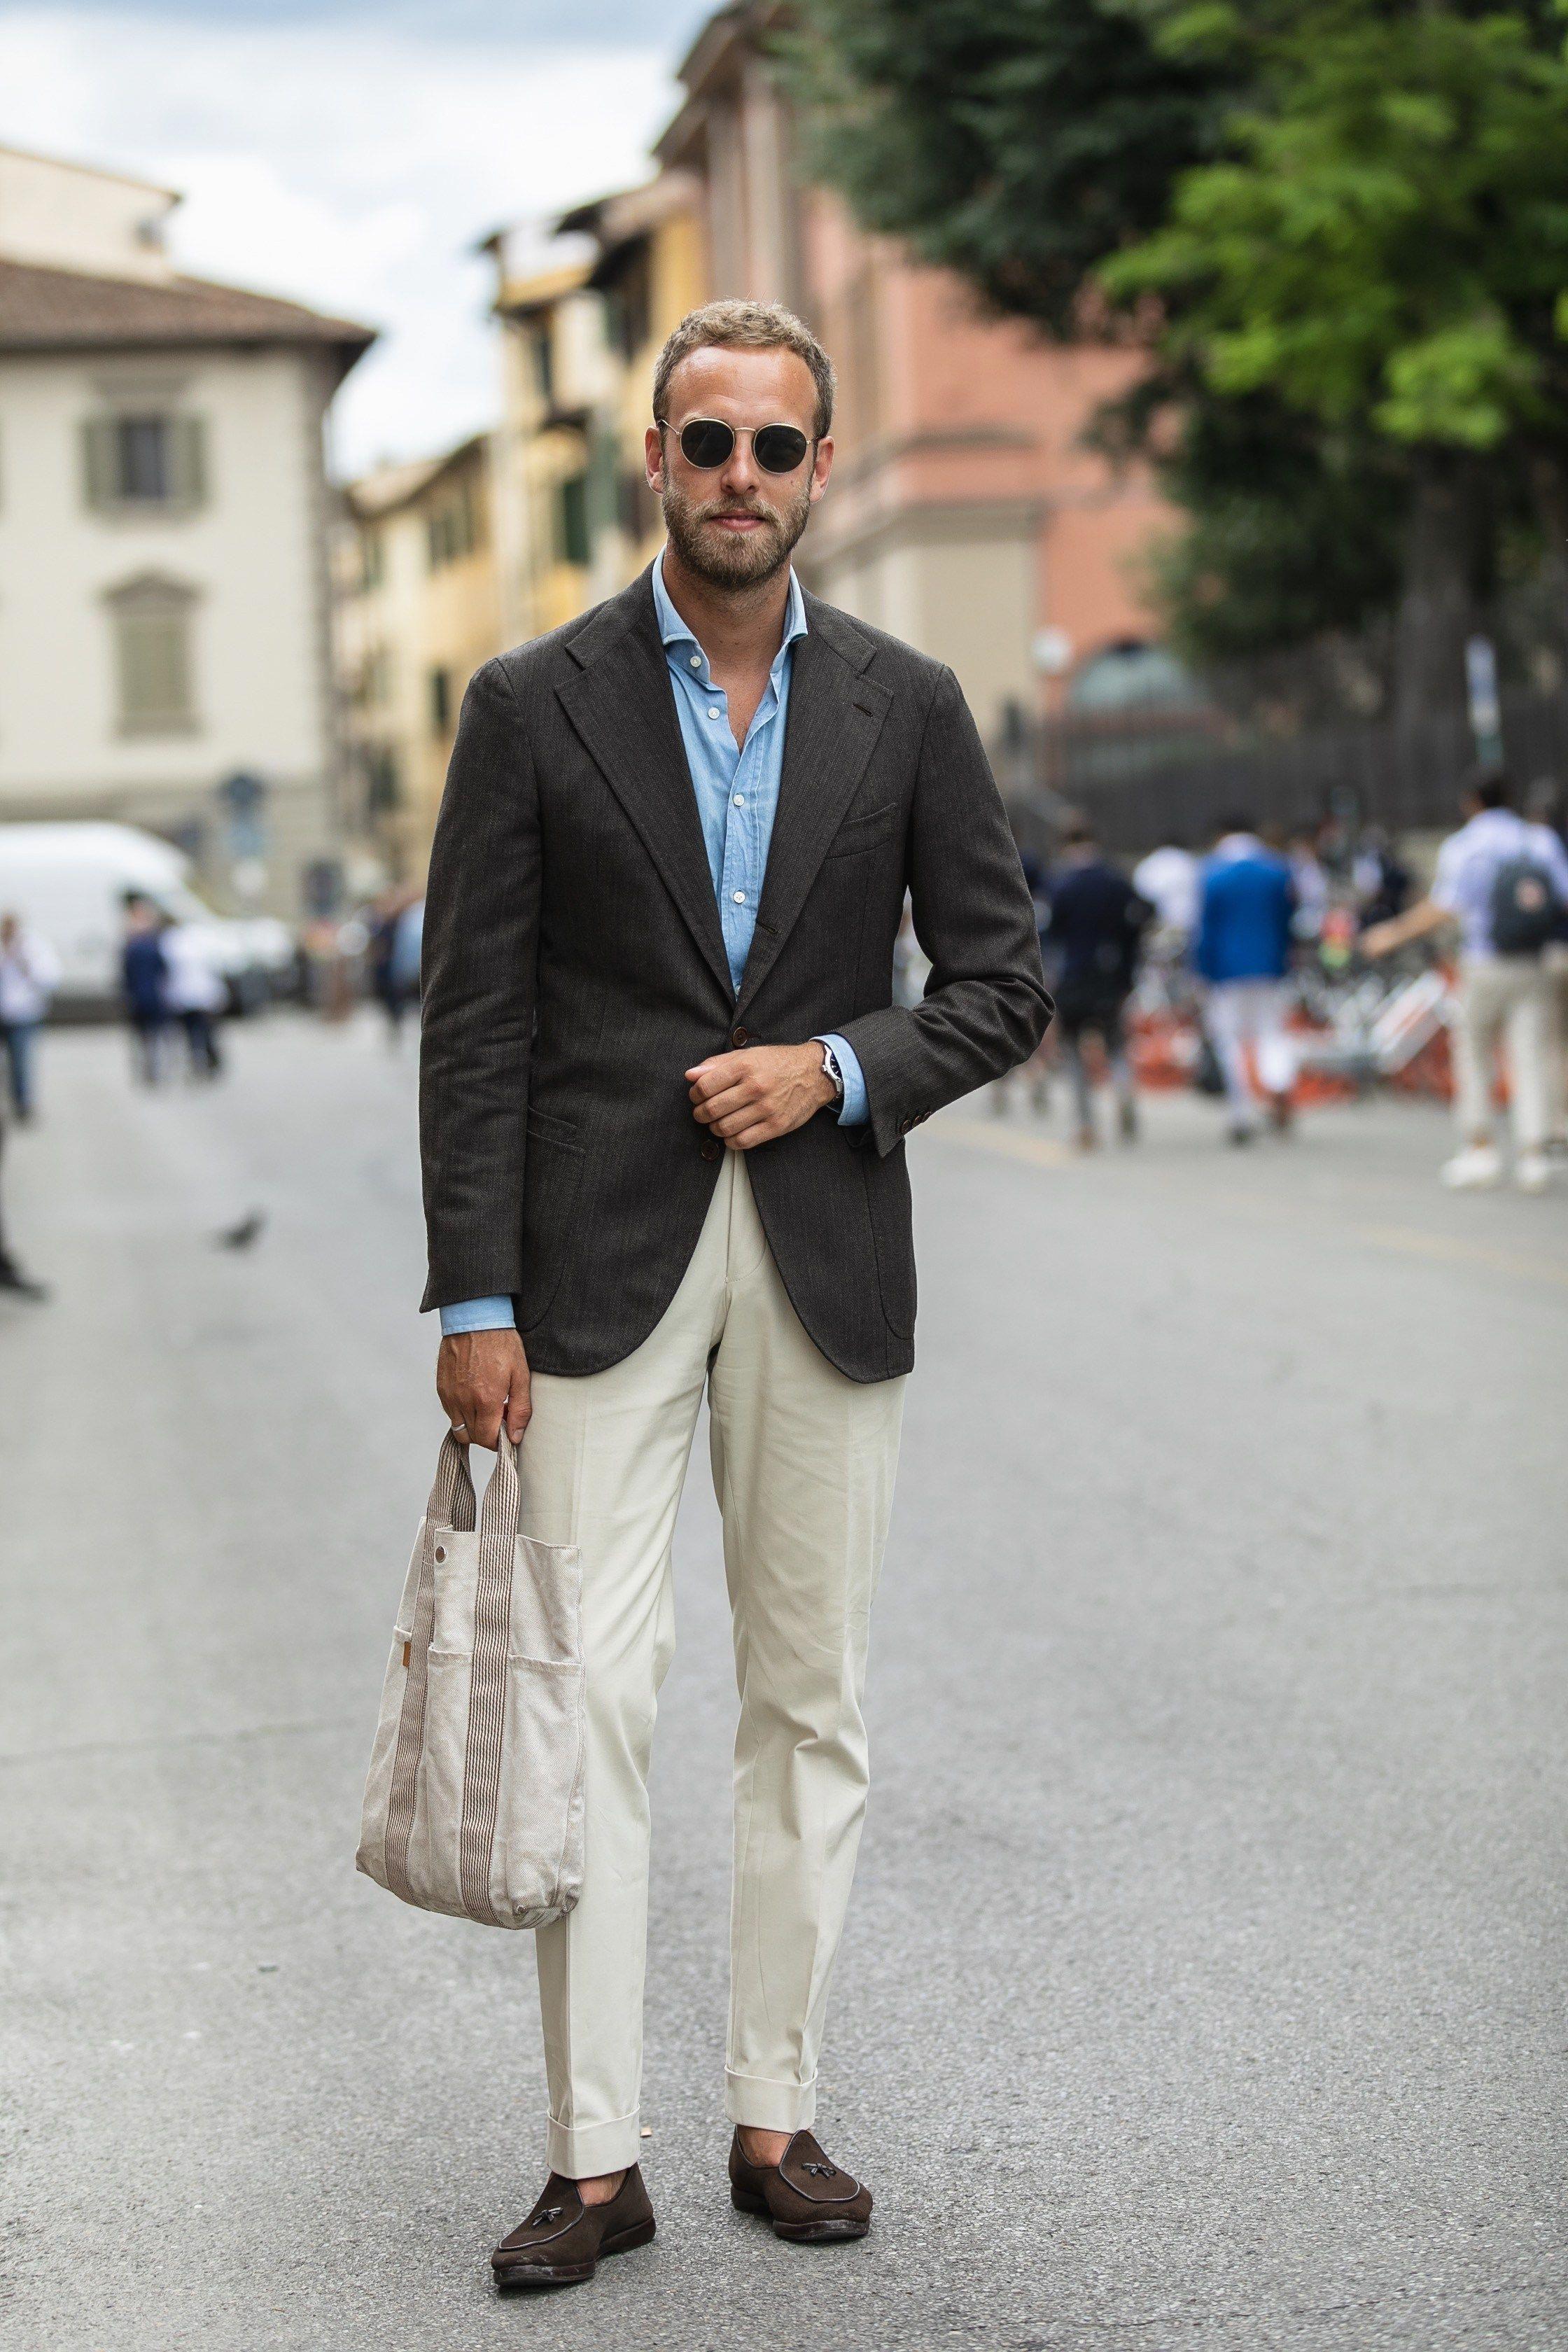 Pitti Uomo 94 Florence Italy Mensfashionsmart Mens Fashion Smart Mens Outfits Spring Outfits Men